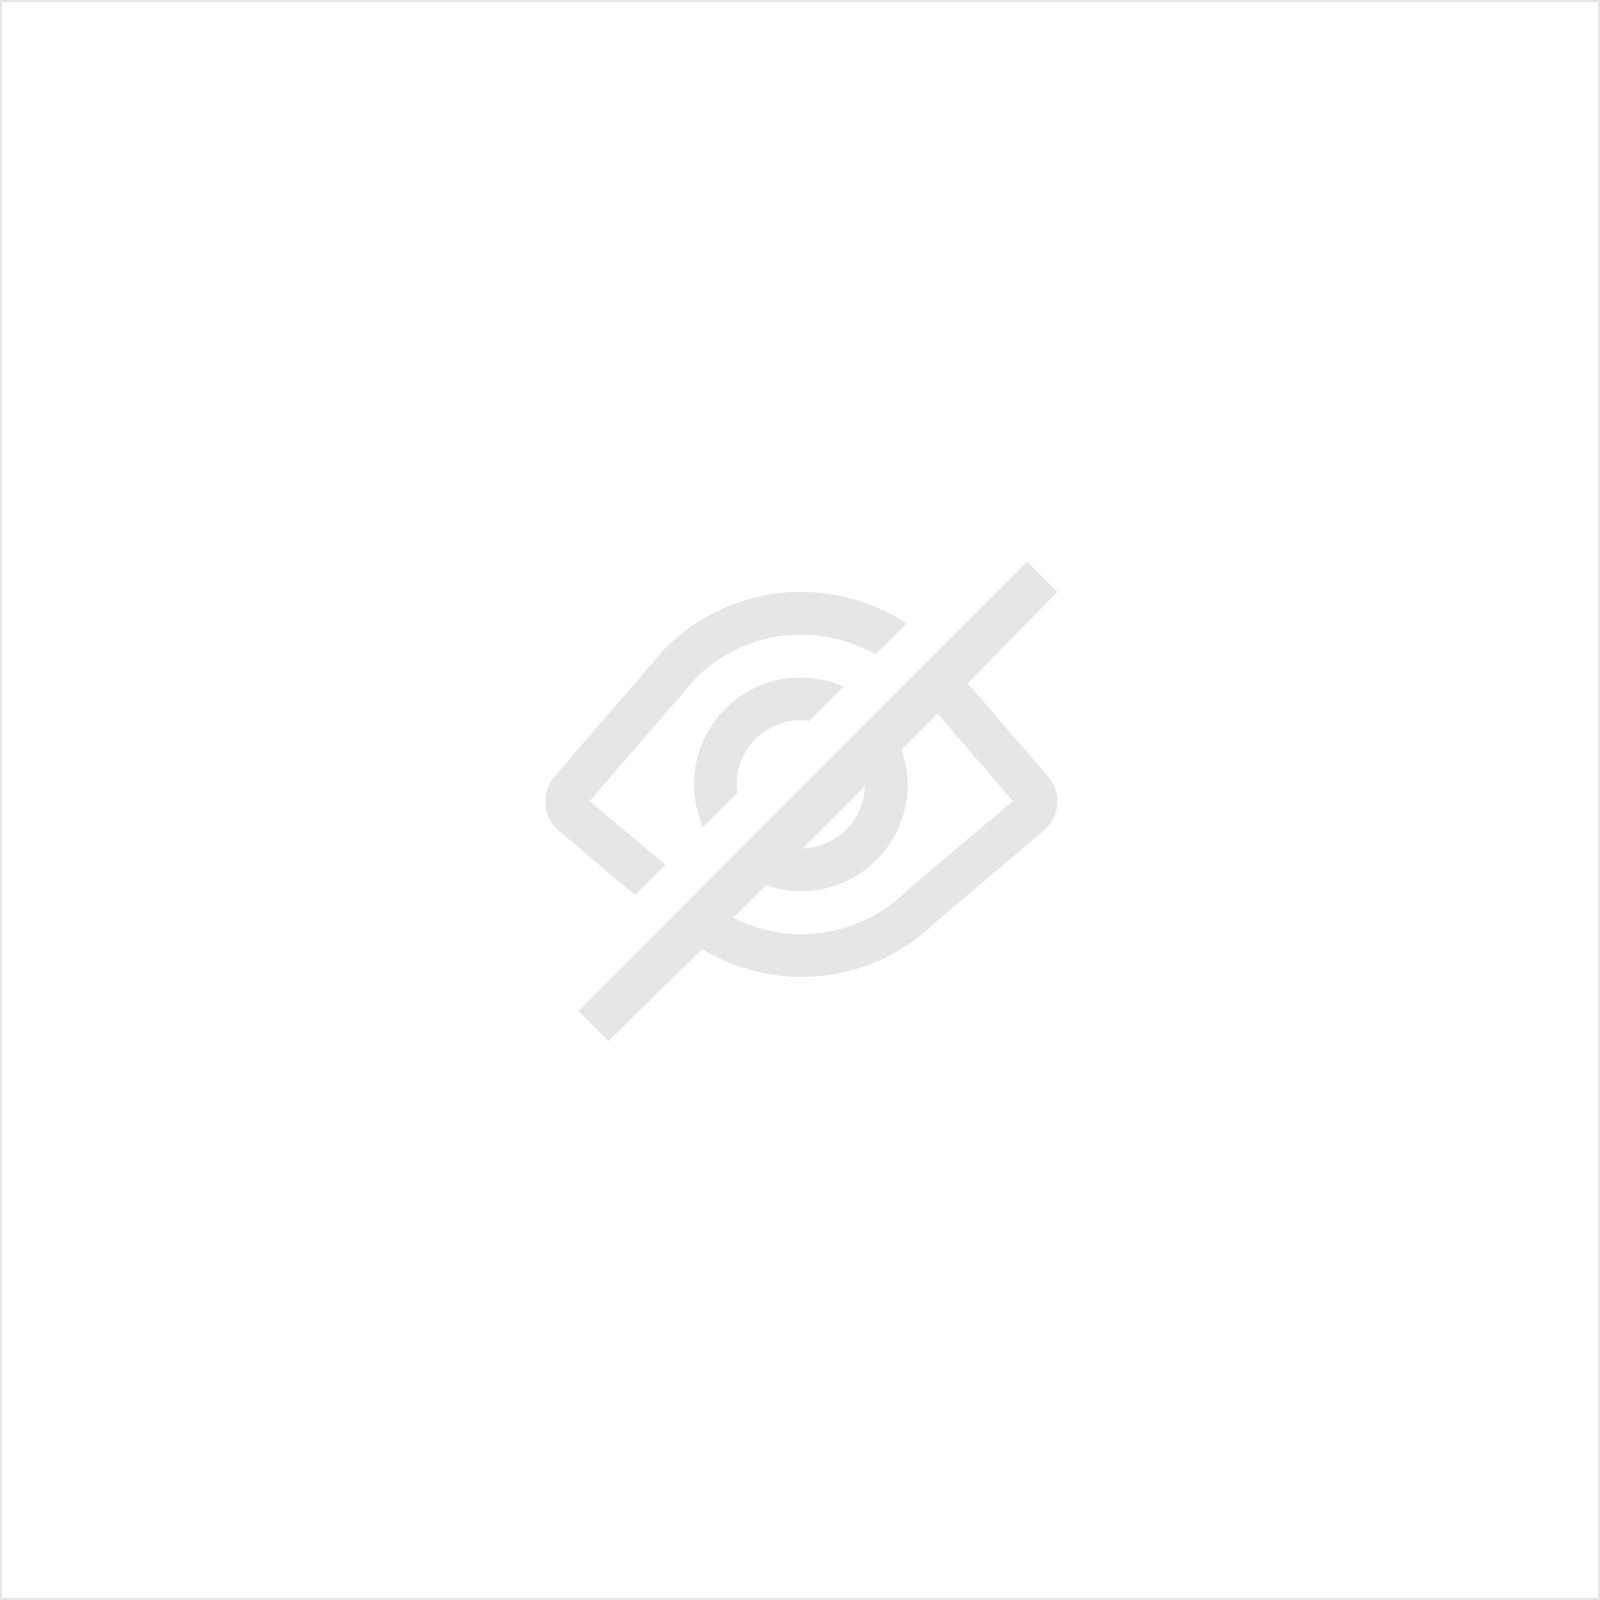 WELDING CLIPS (5 PCS)